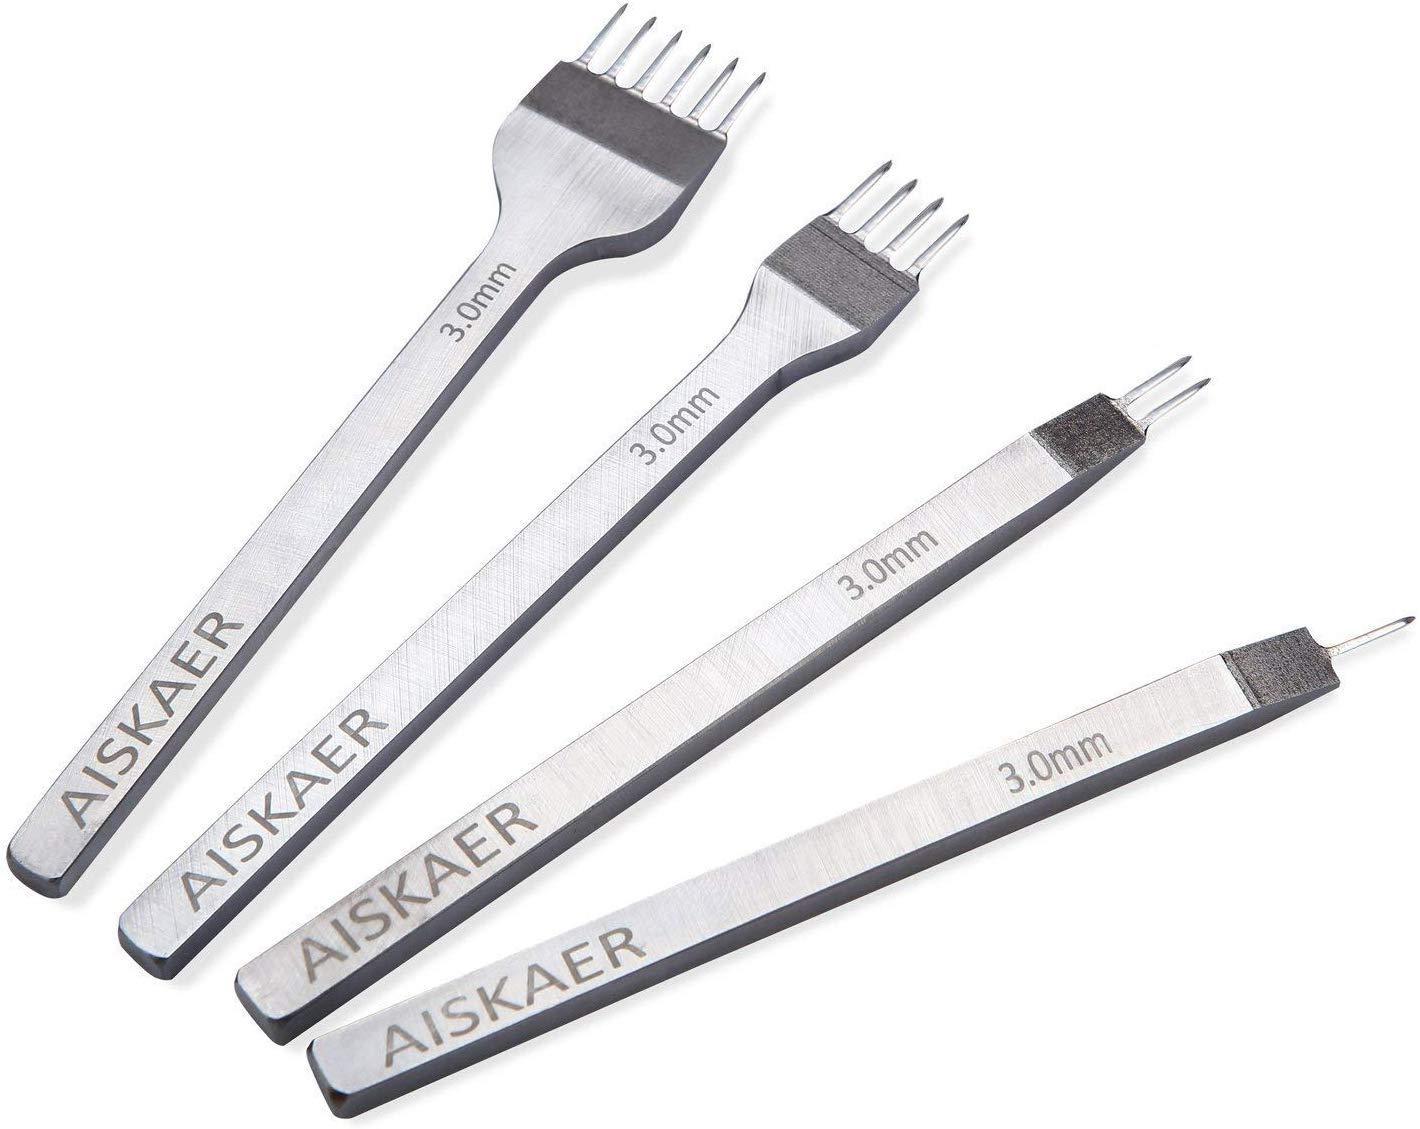 Aiskaer White Steel 3mm 1/2/4/6 Prong DIY Diamond Lacing Stitching Chisel Set Leather Craft Kits